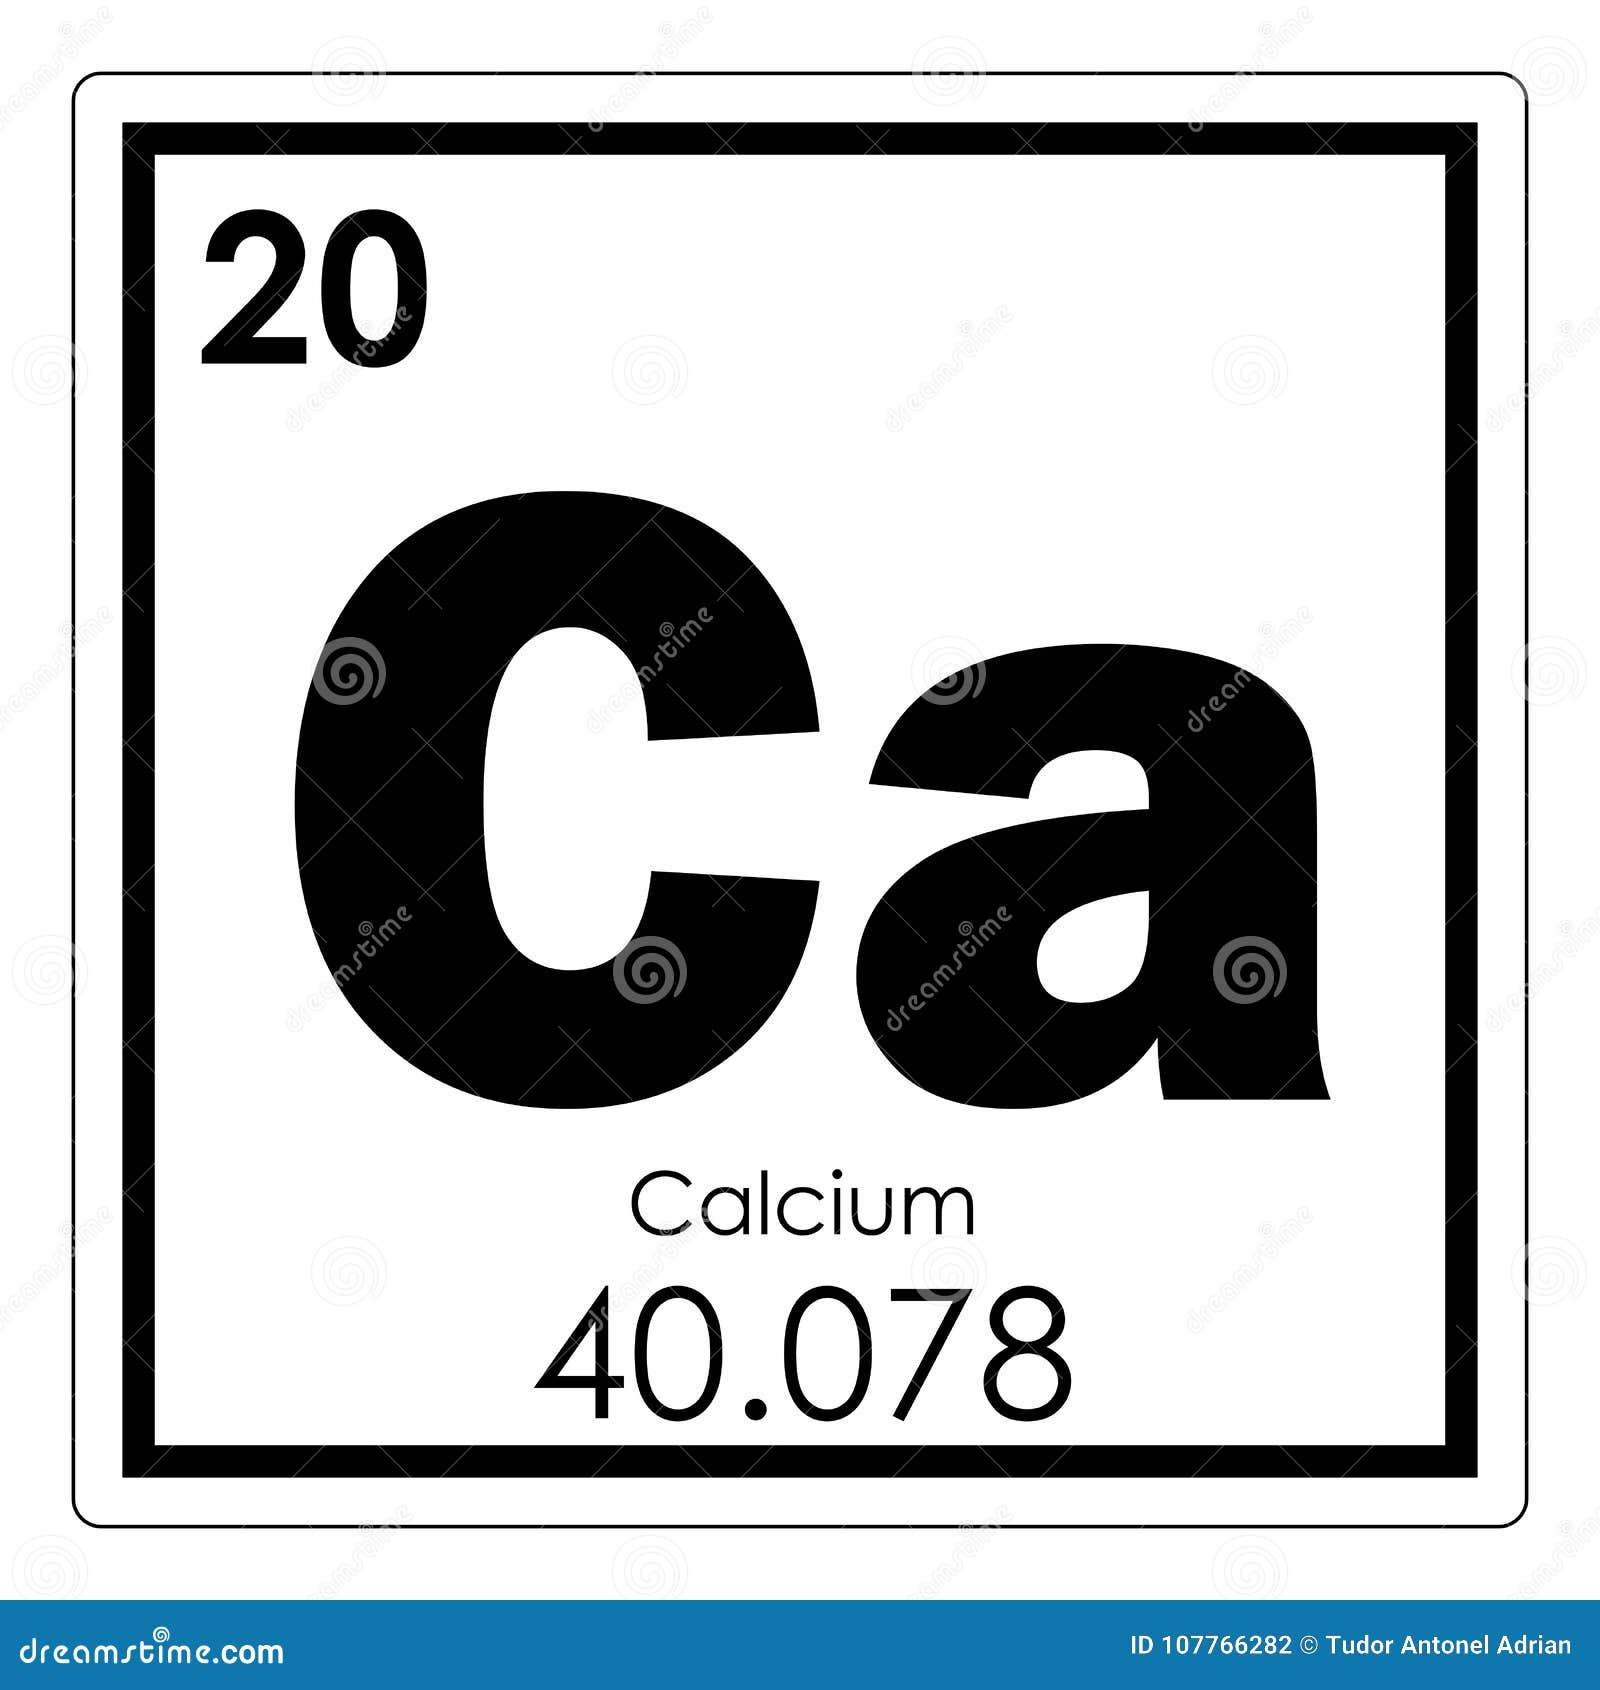 Calcium Chemical Element Stock Illustration Illustration Of